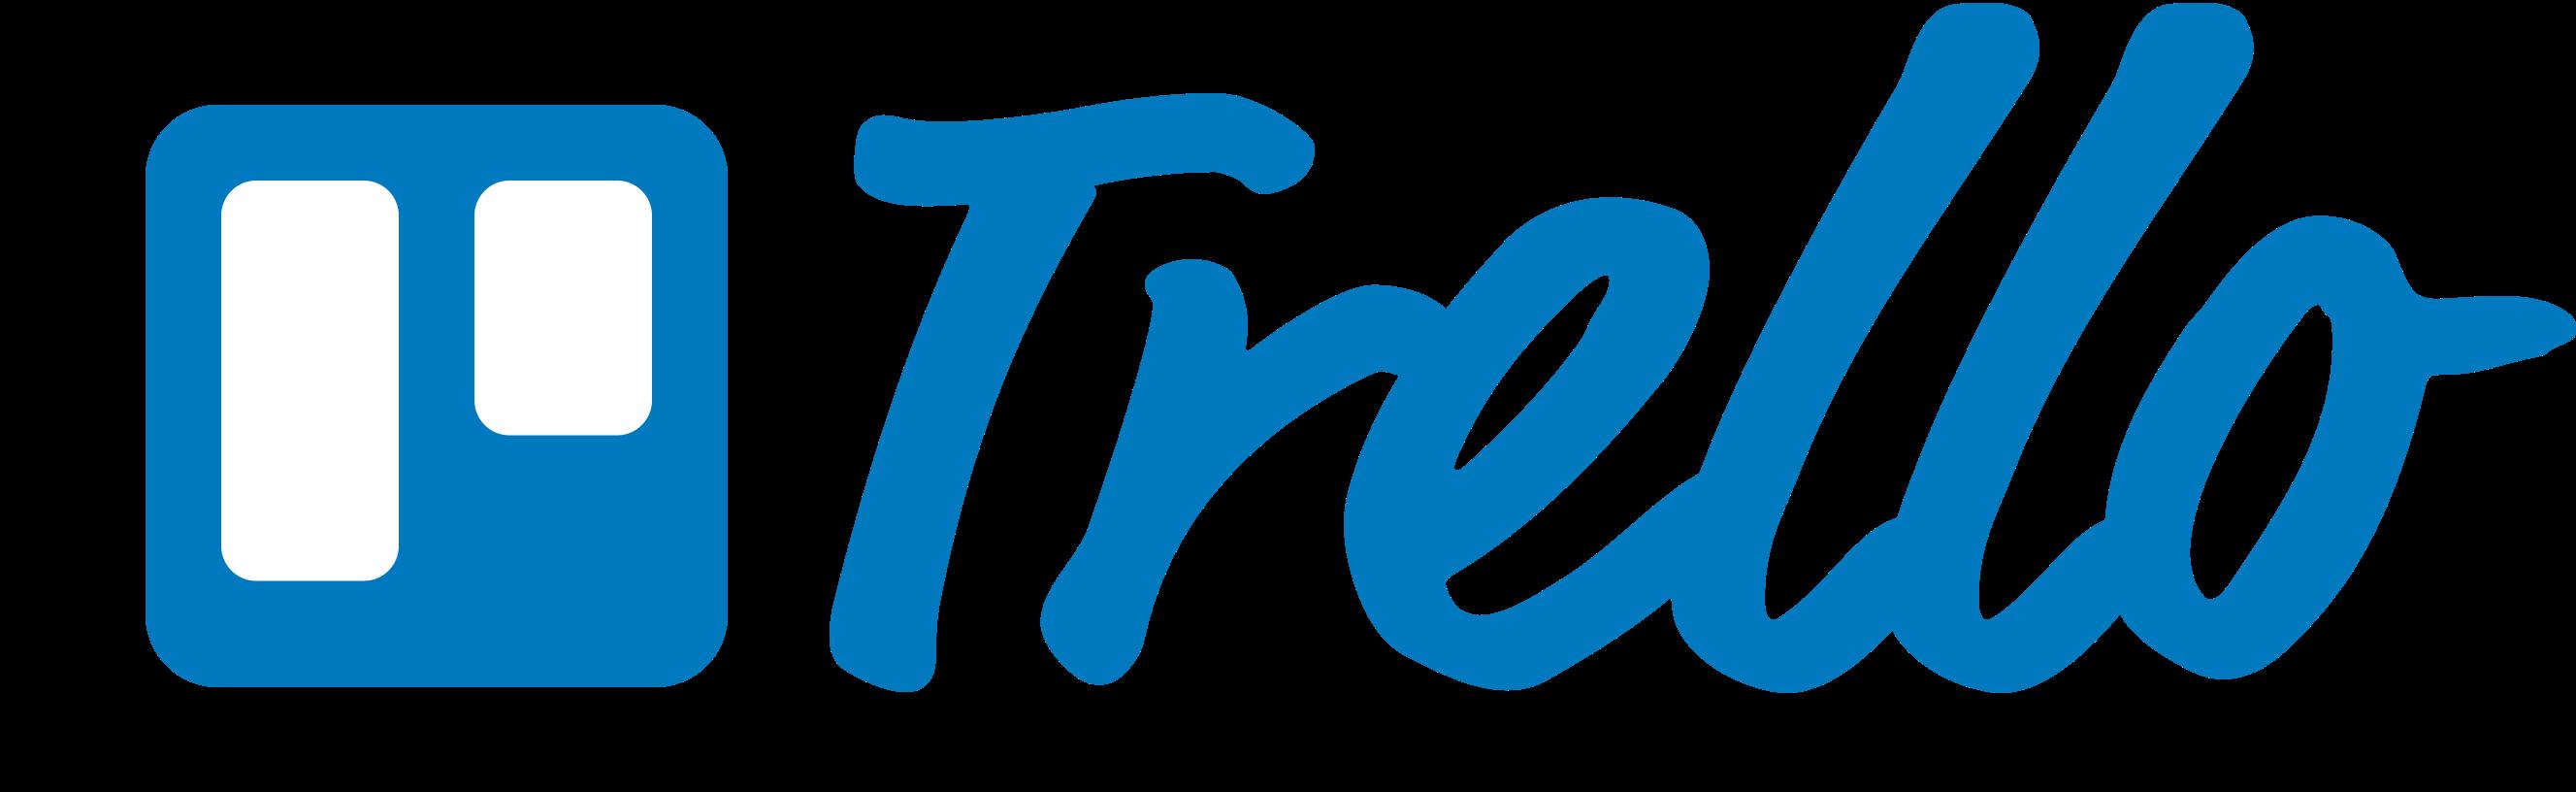 Trello Recommended LIVETHEFUEL